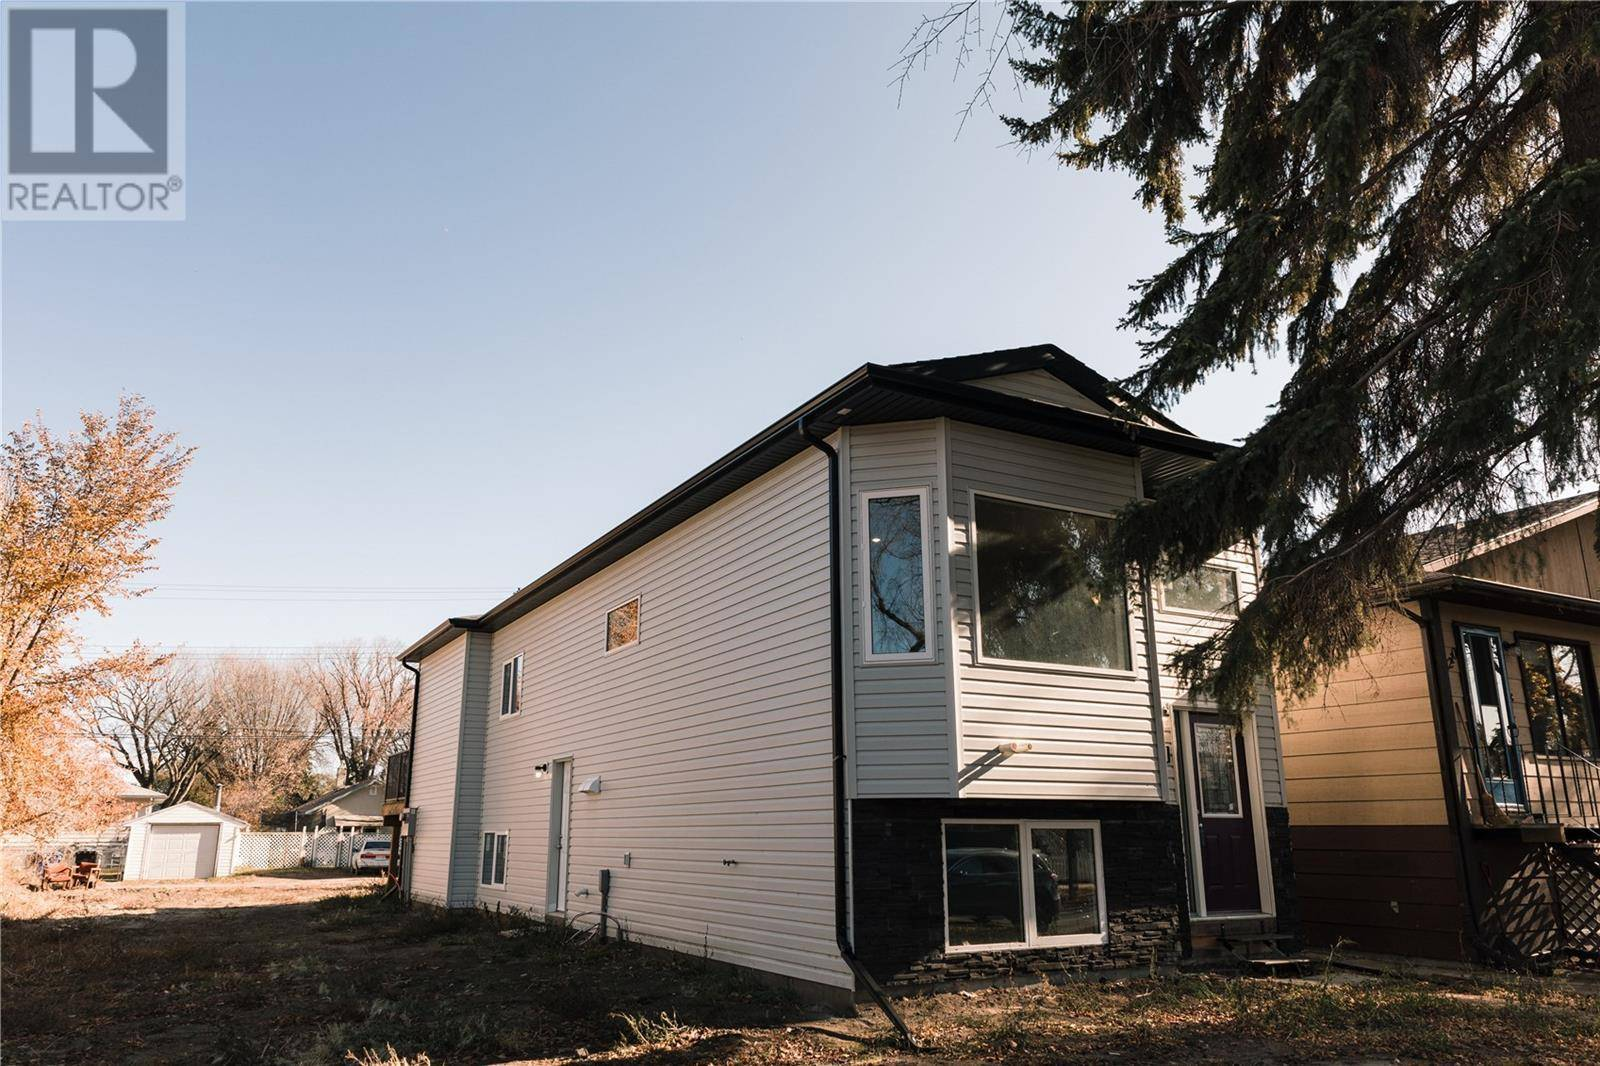 House for sale at 1208 K Ave S Saskatoon Saskatchewan - MLS: SK793312